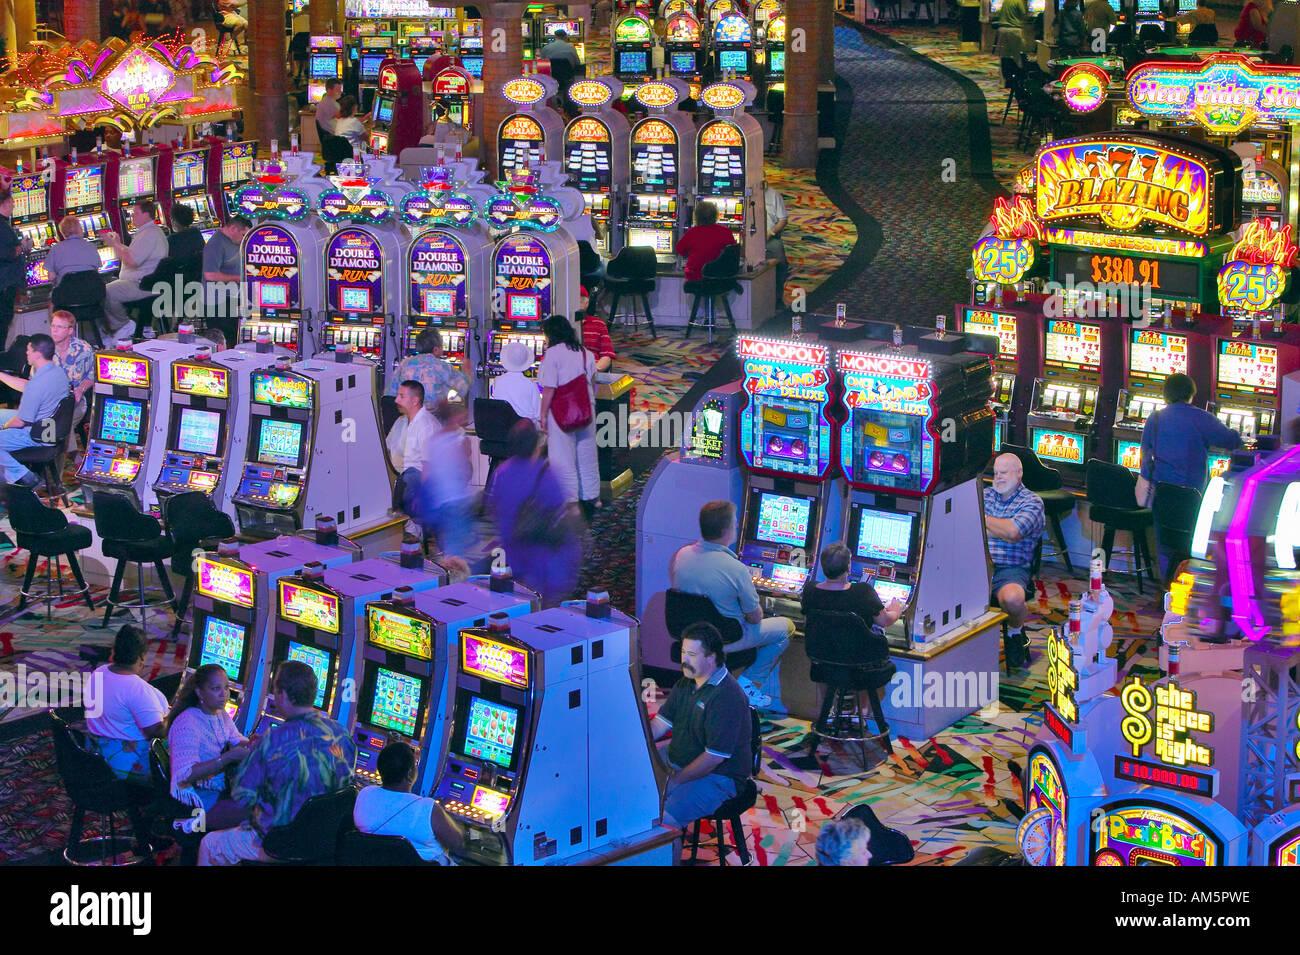 At rio casino in silver oak casino no deposit bonus codes